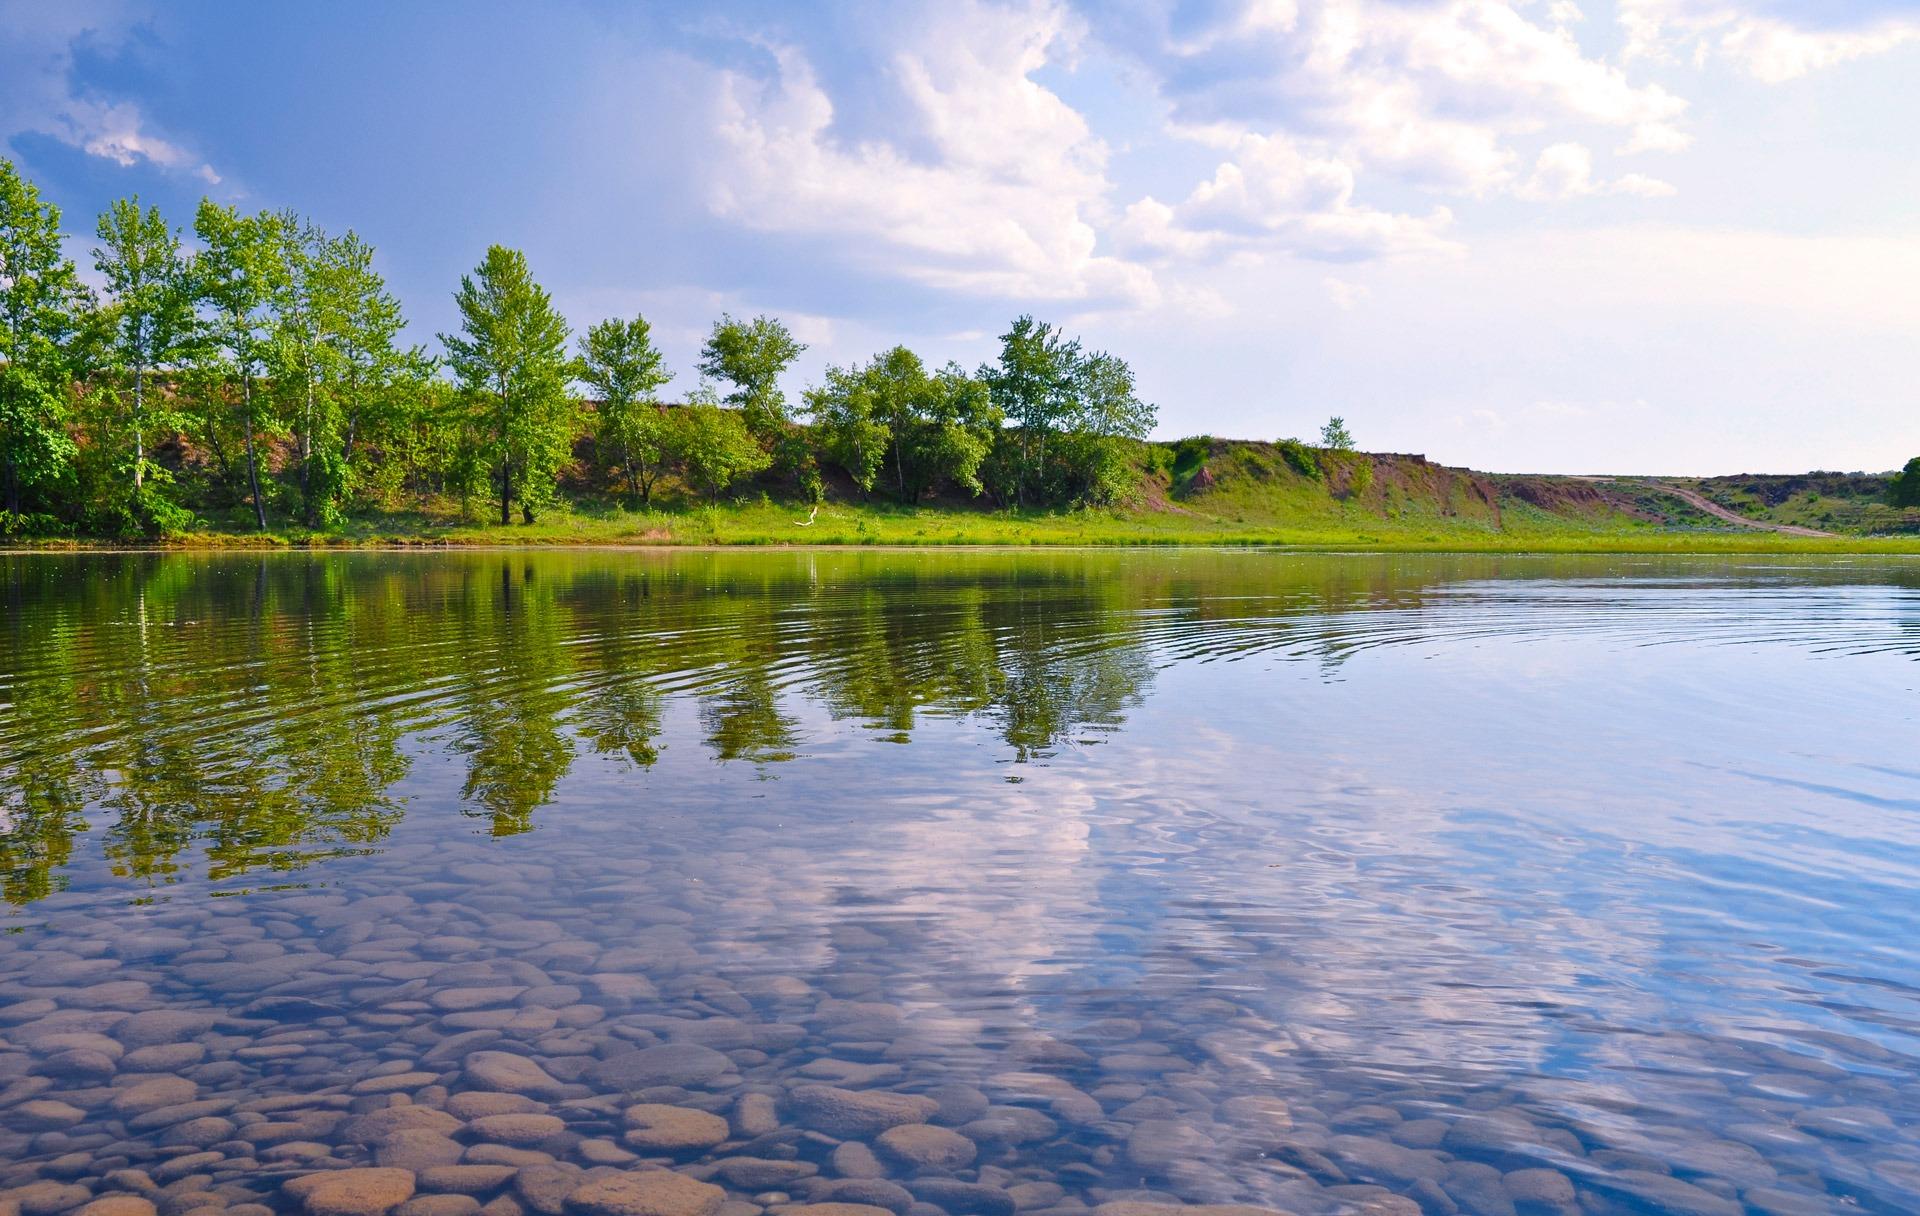 видобуток бурштину прозрачные реки и озера фото они